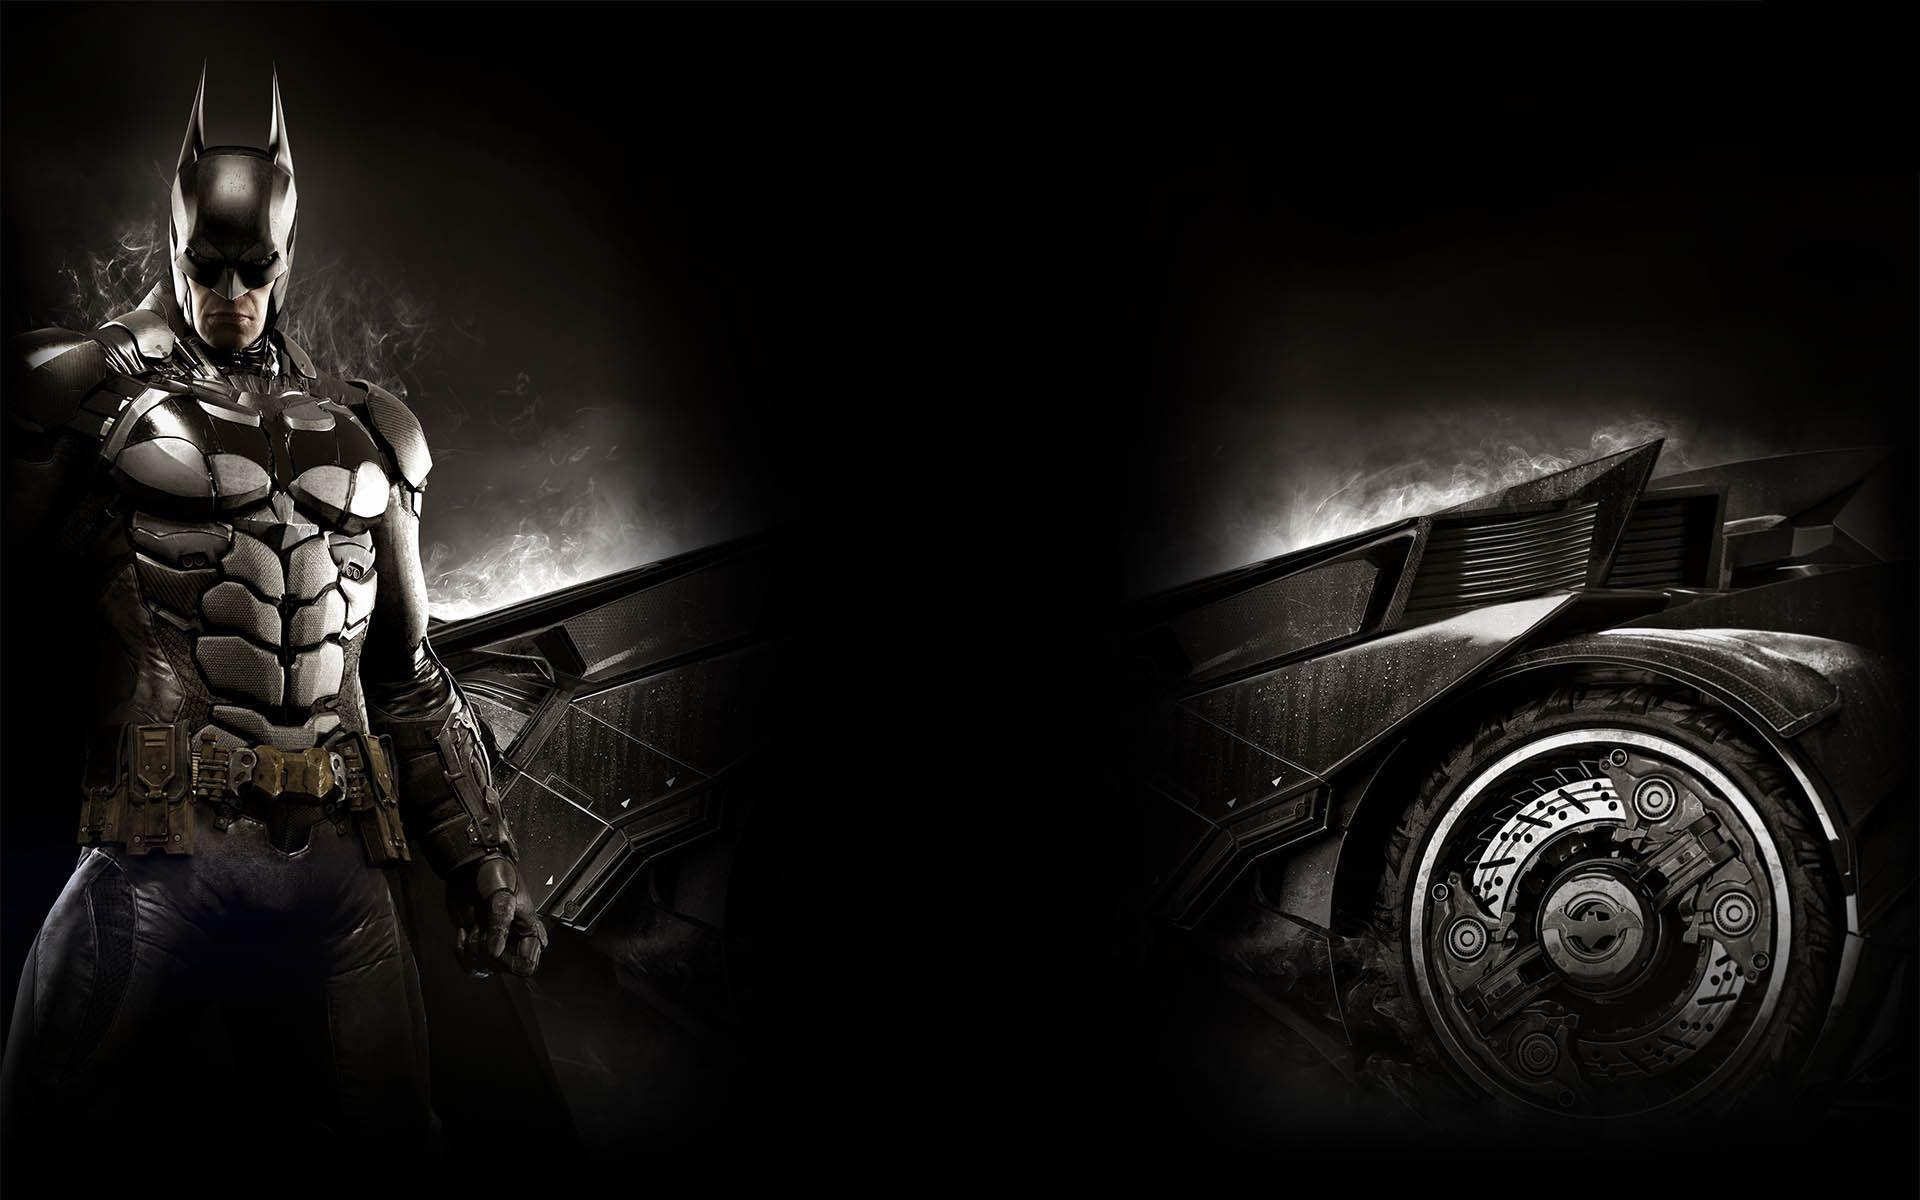 Batman: Arkham Knight Wallpapers - Wallpaper Cave